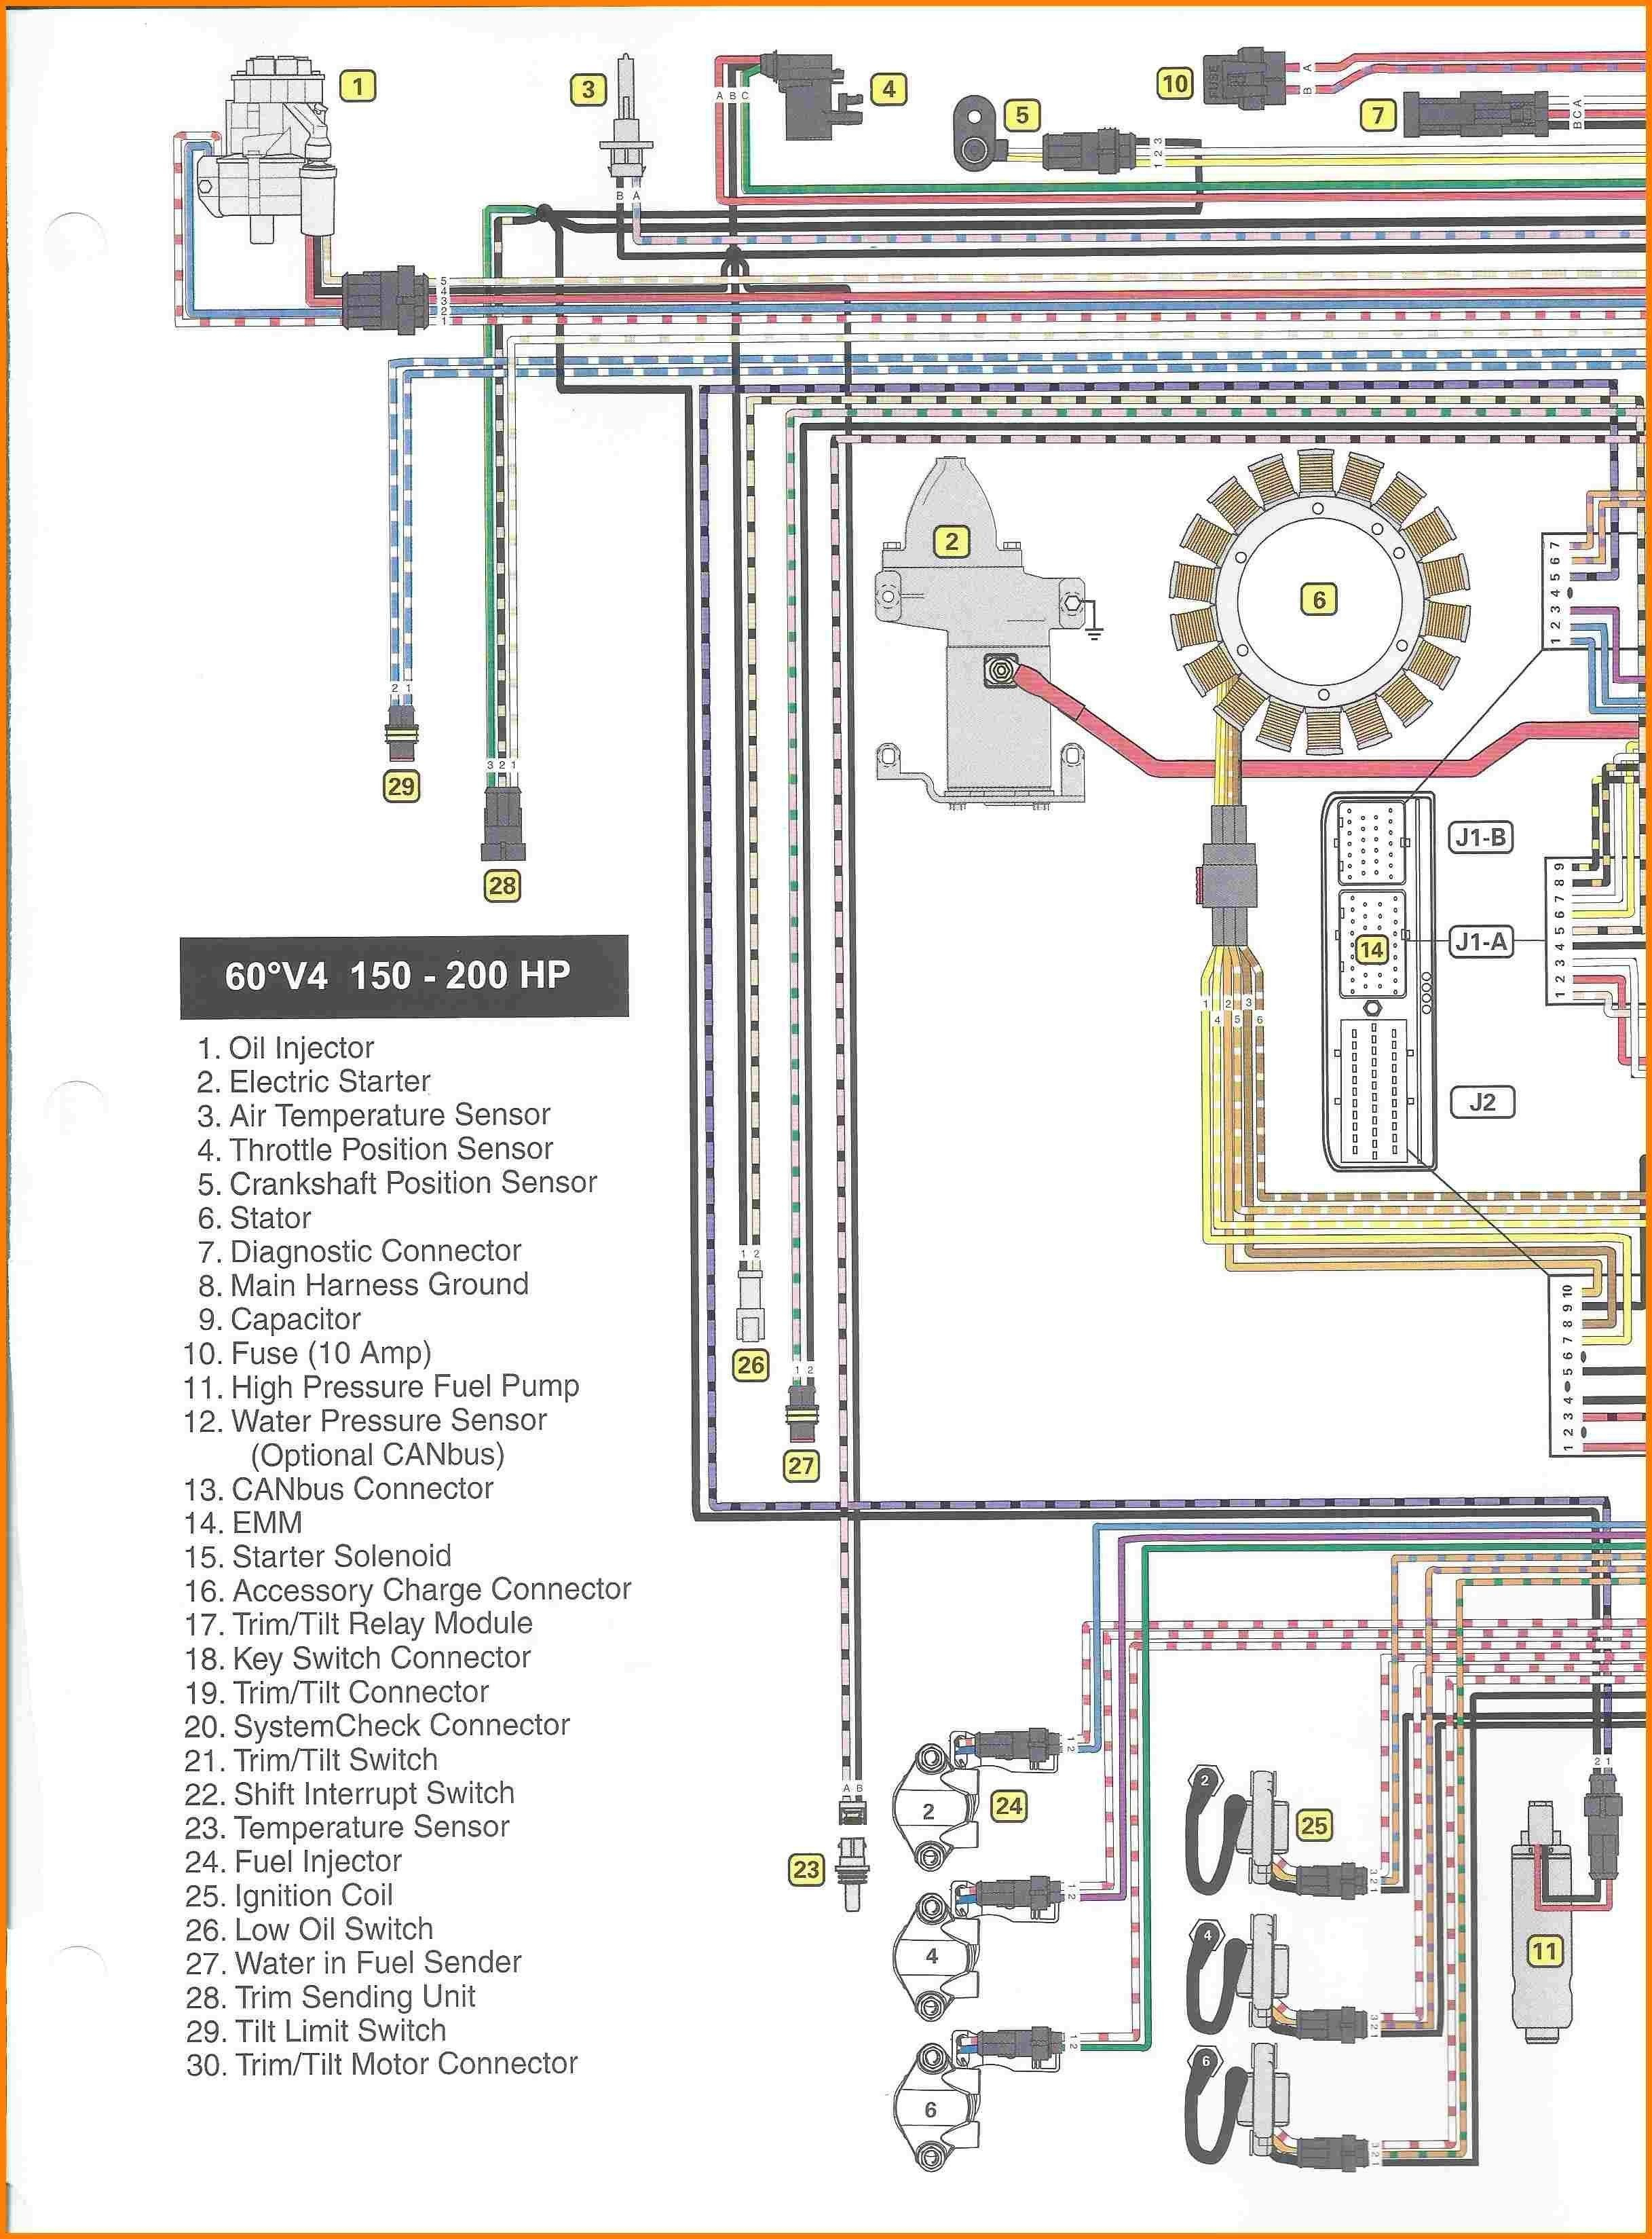 12 24 Battery Wiring Diagram - Wiring Diagrams List Rampage Tailgate Light Bar Wiring Diagram on